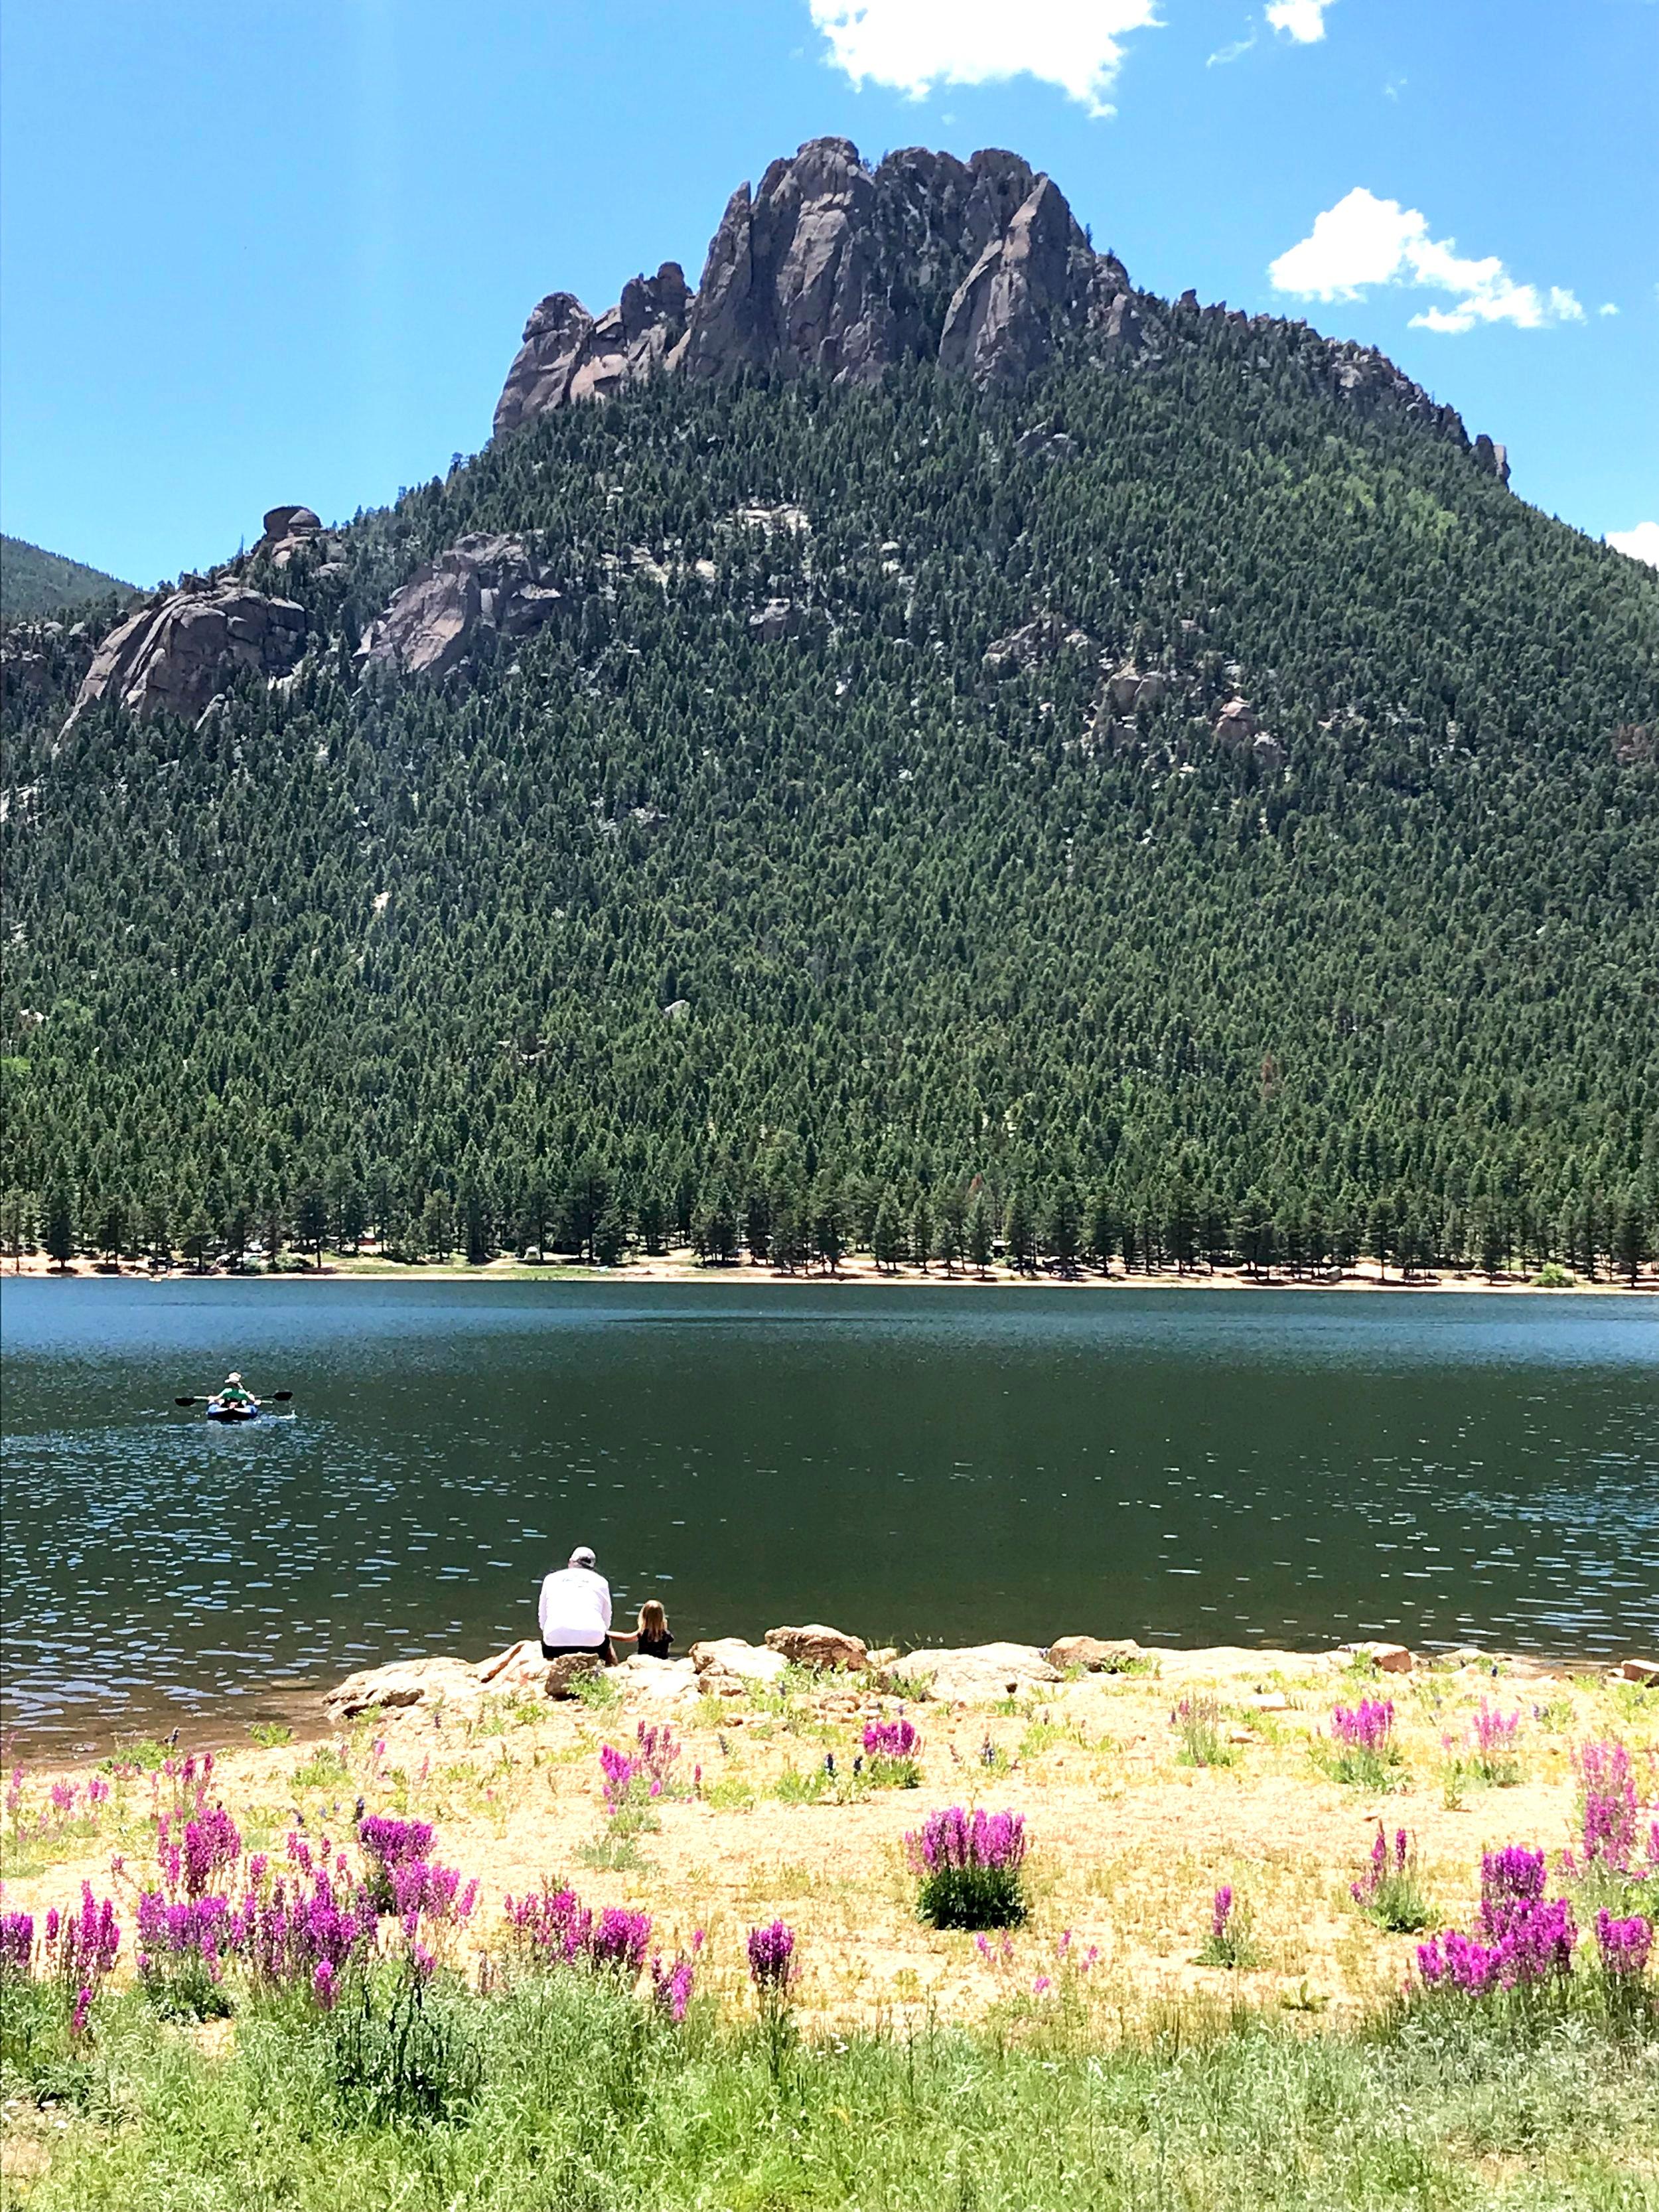 A dad and his girl Wellington Lake.